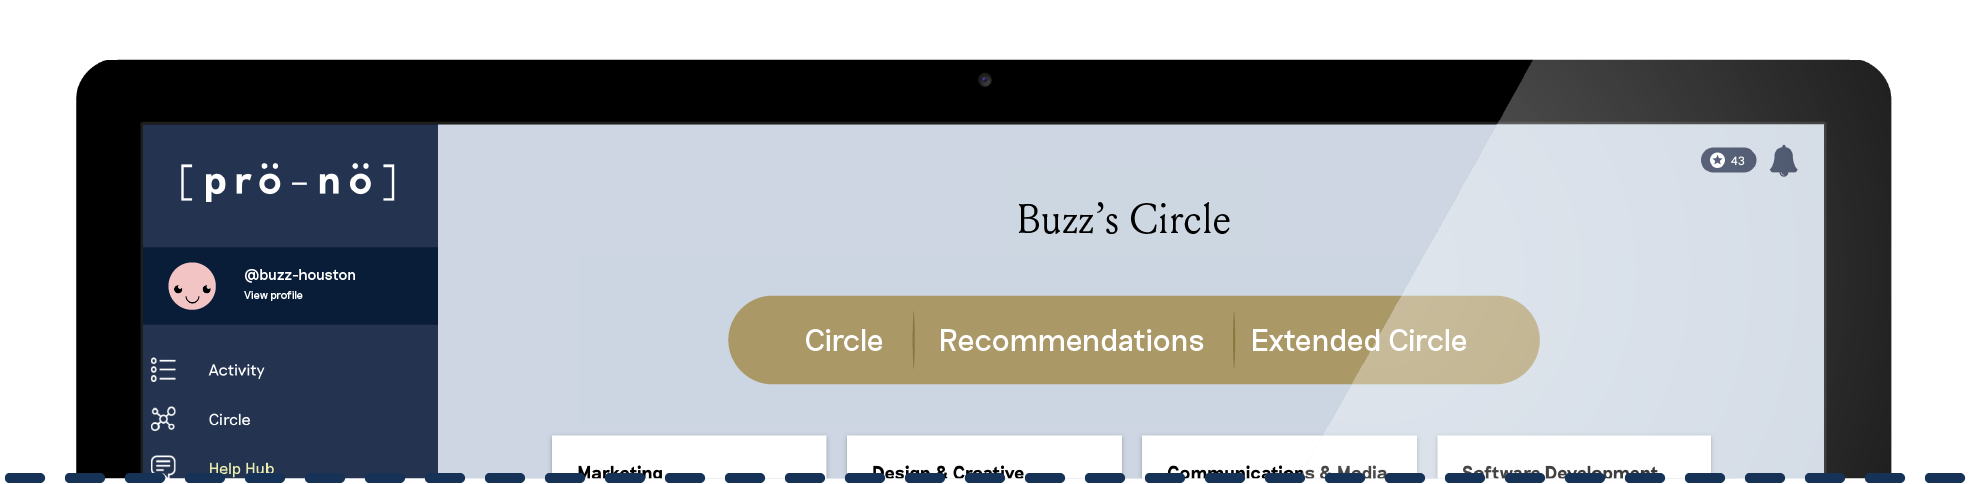 Prönö Circle